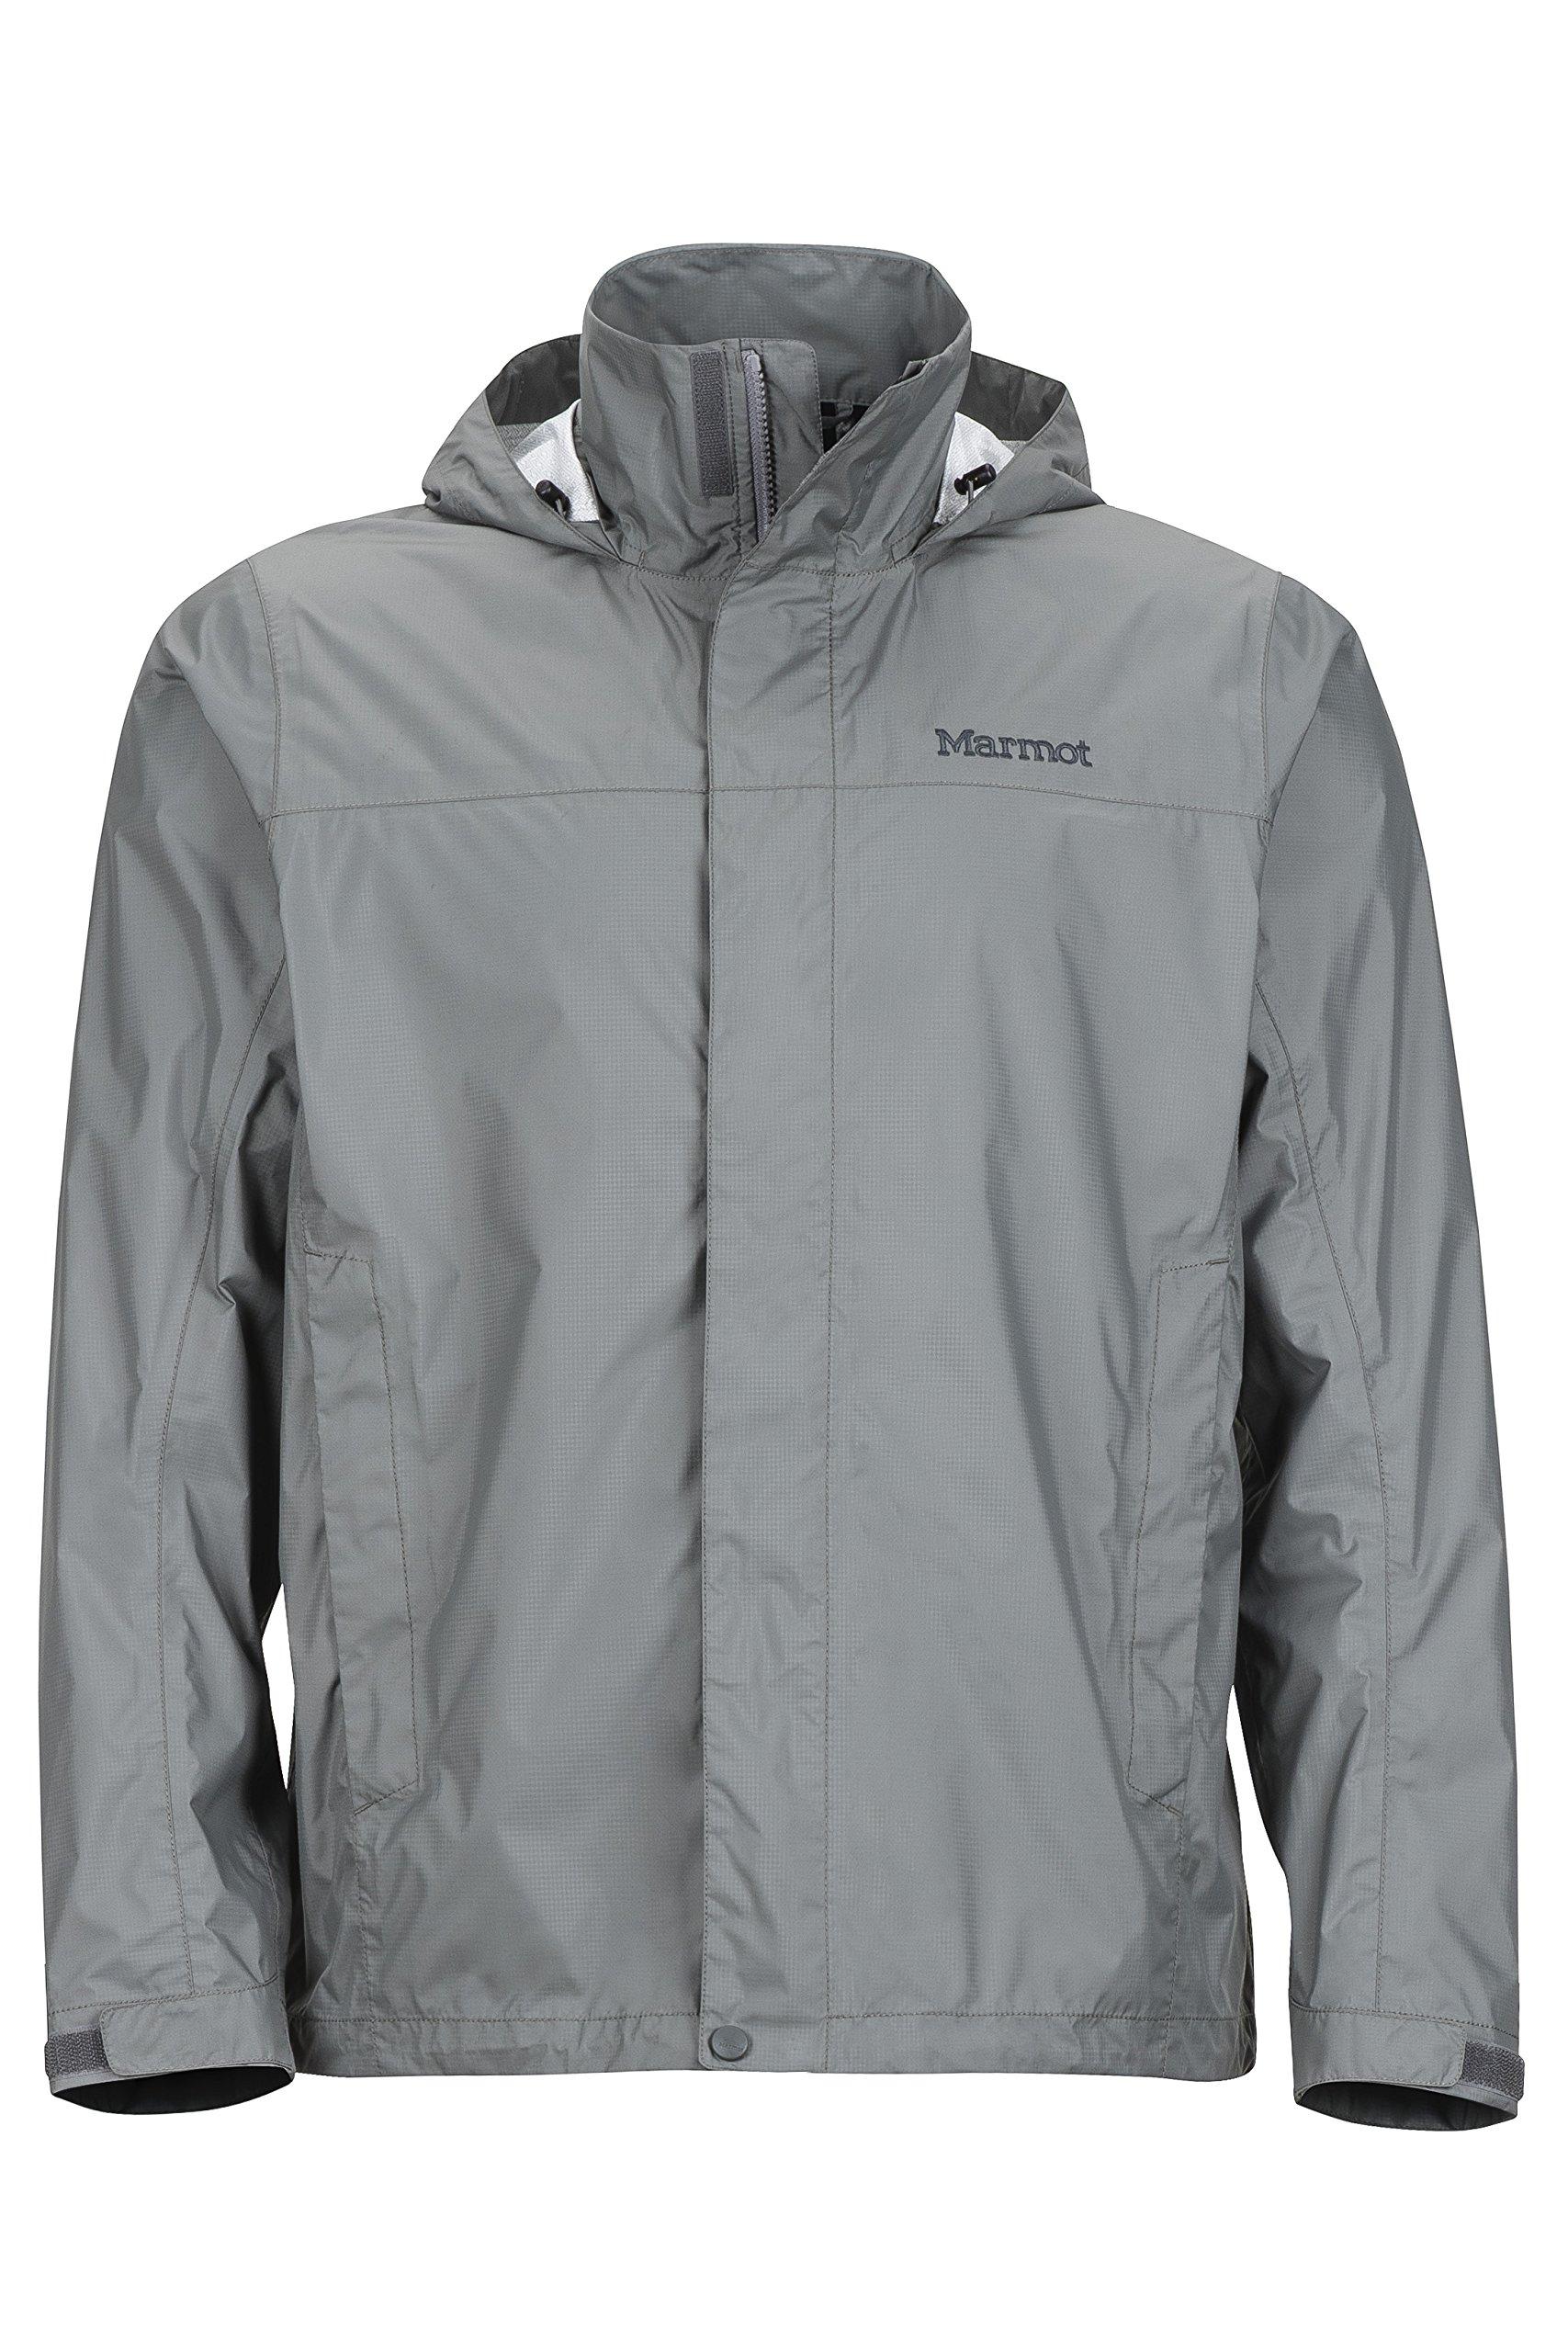 Marmot Men's PreCip Jacket, Gargoyle, S